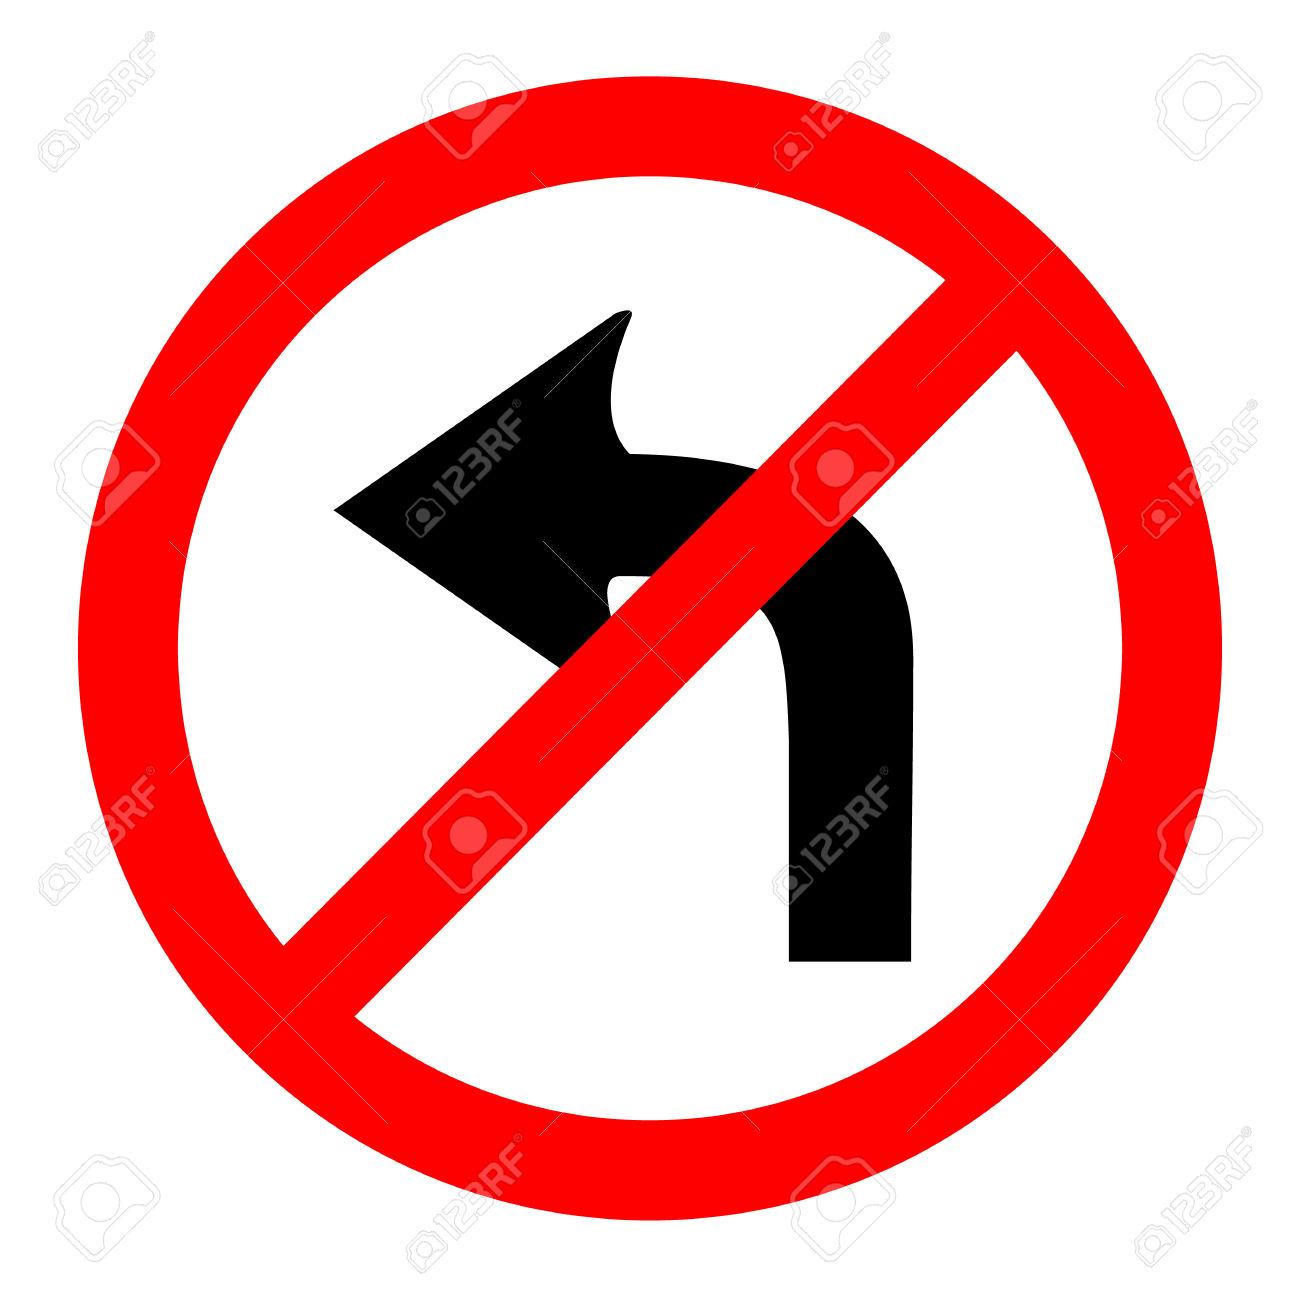 Illustration Of No Left Turn Round Sign On White Background.